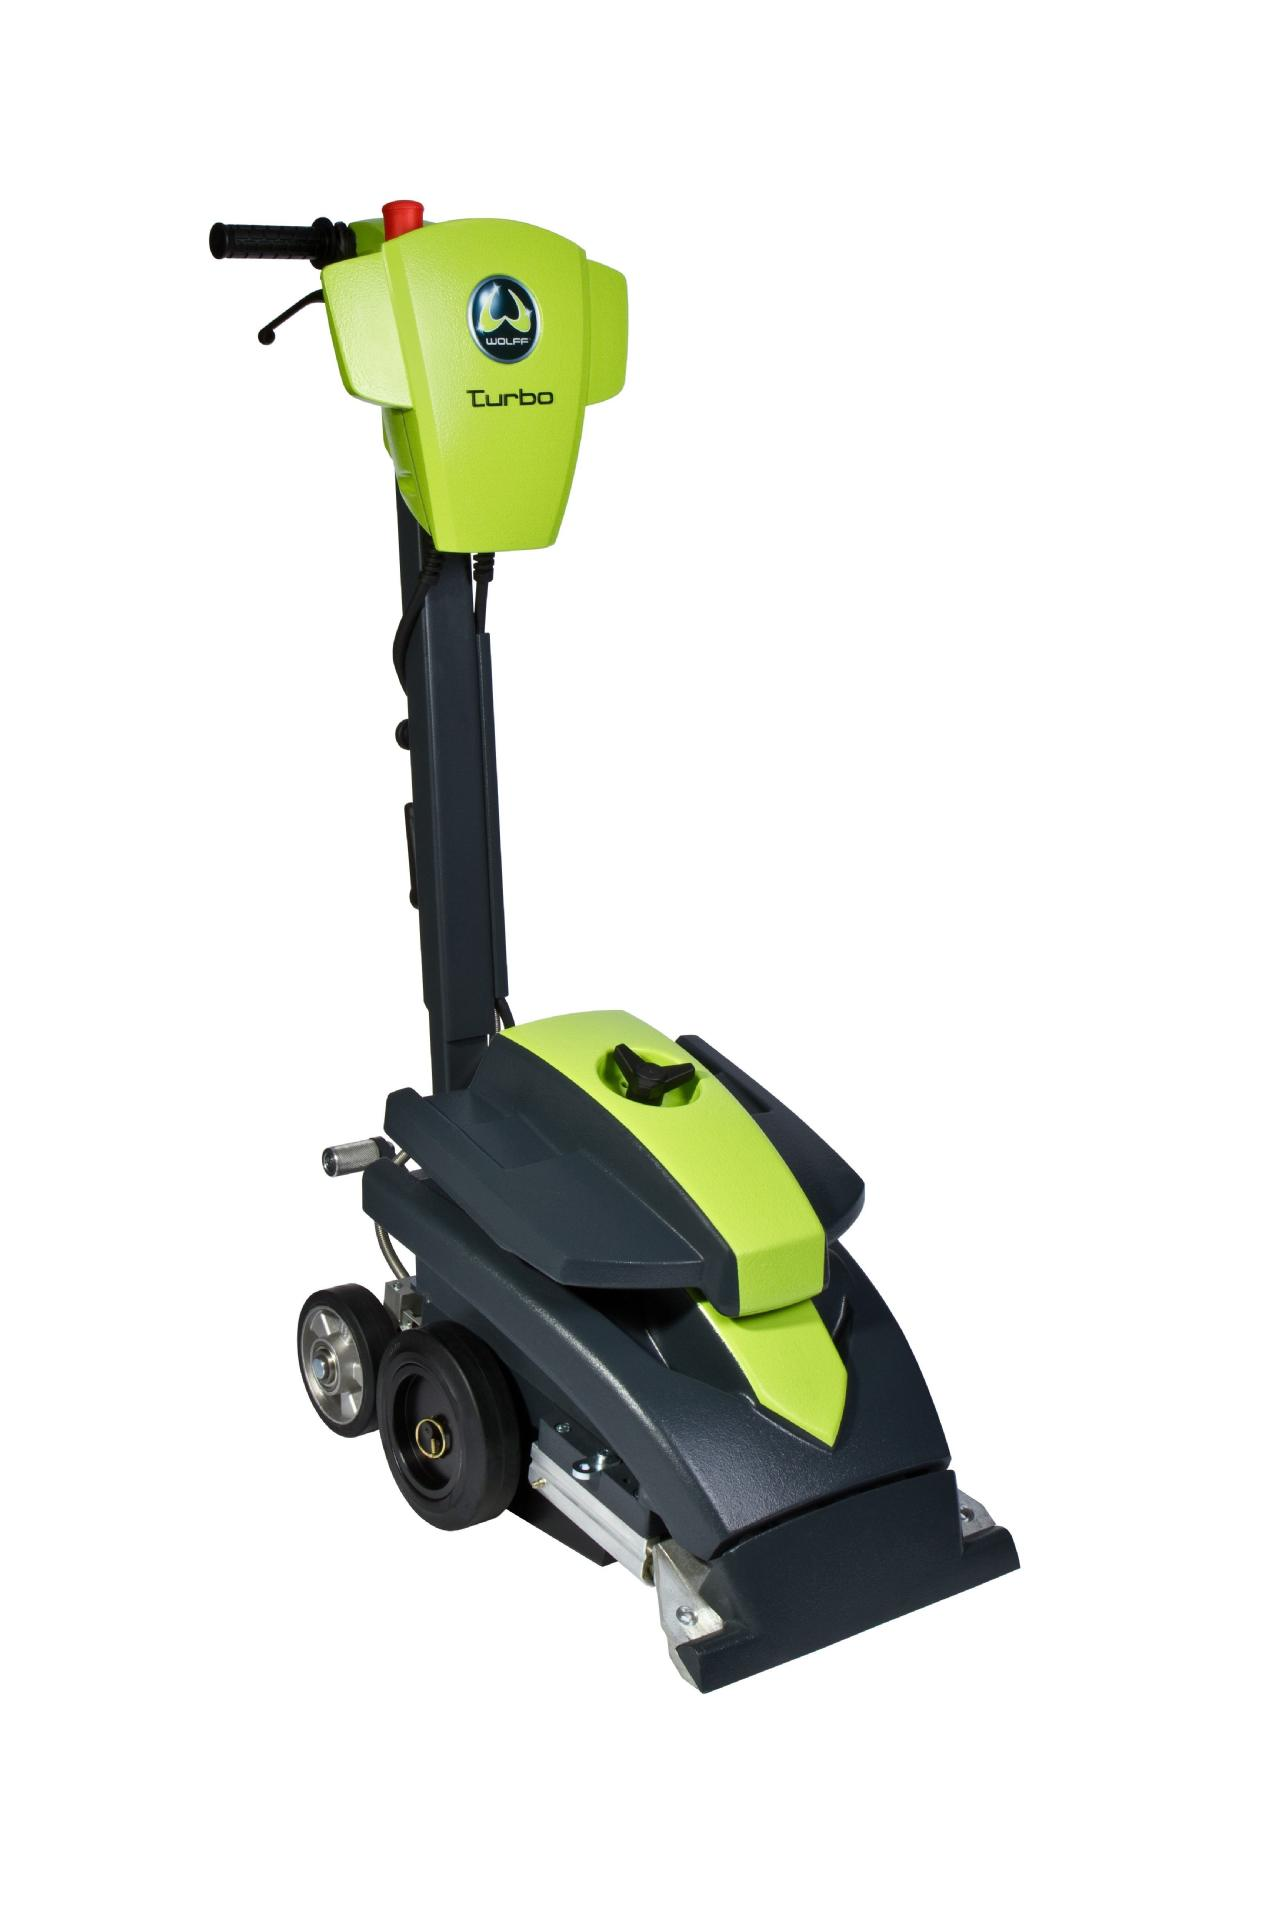 Carpet or glue flooring stripper, 220v, 157kg, 60 to 100m2 per hour (1)